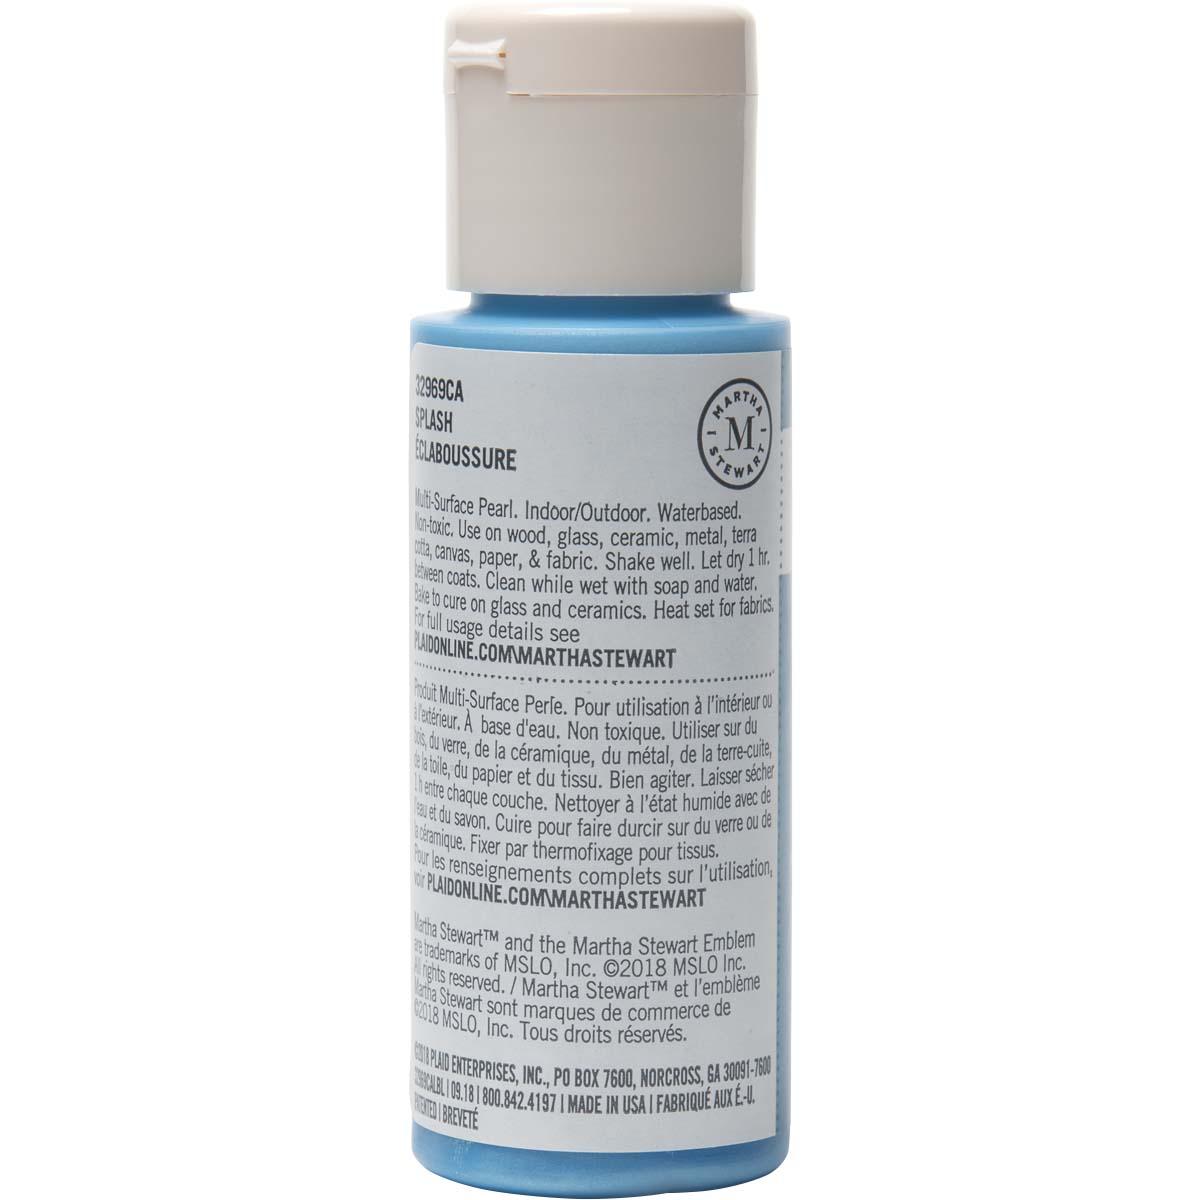 Martha Stewart ® Multi-Surface Pearl Acrylic Craft Paint - Splash, 2 oz. - 32969CA